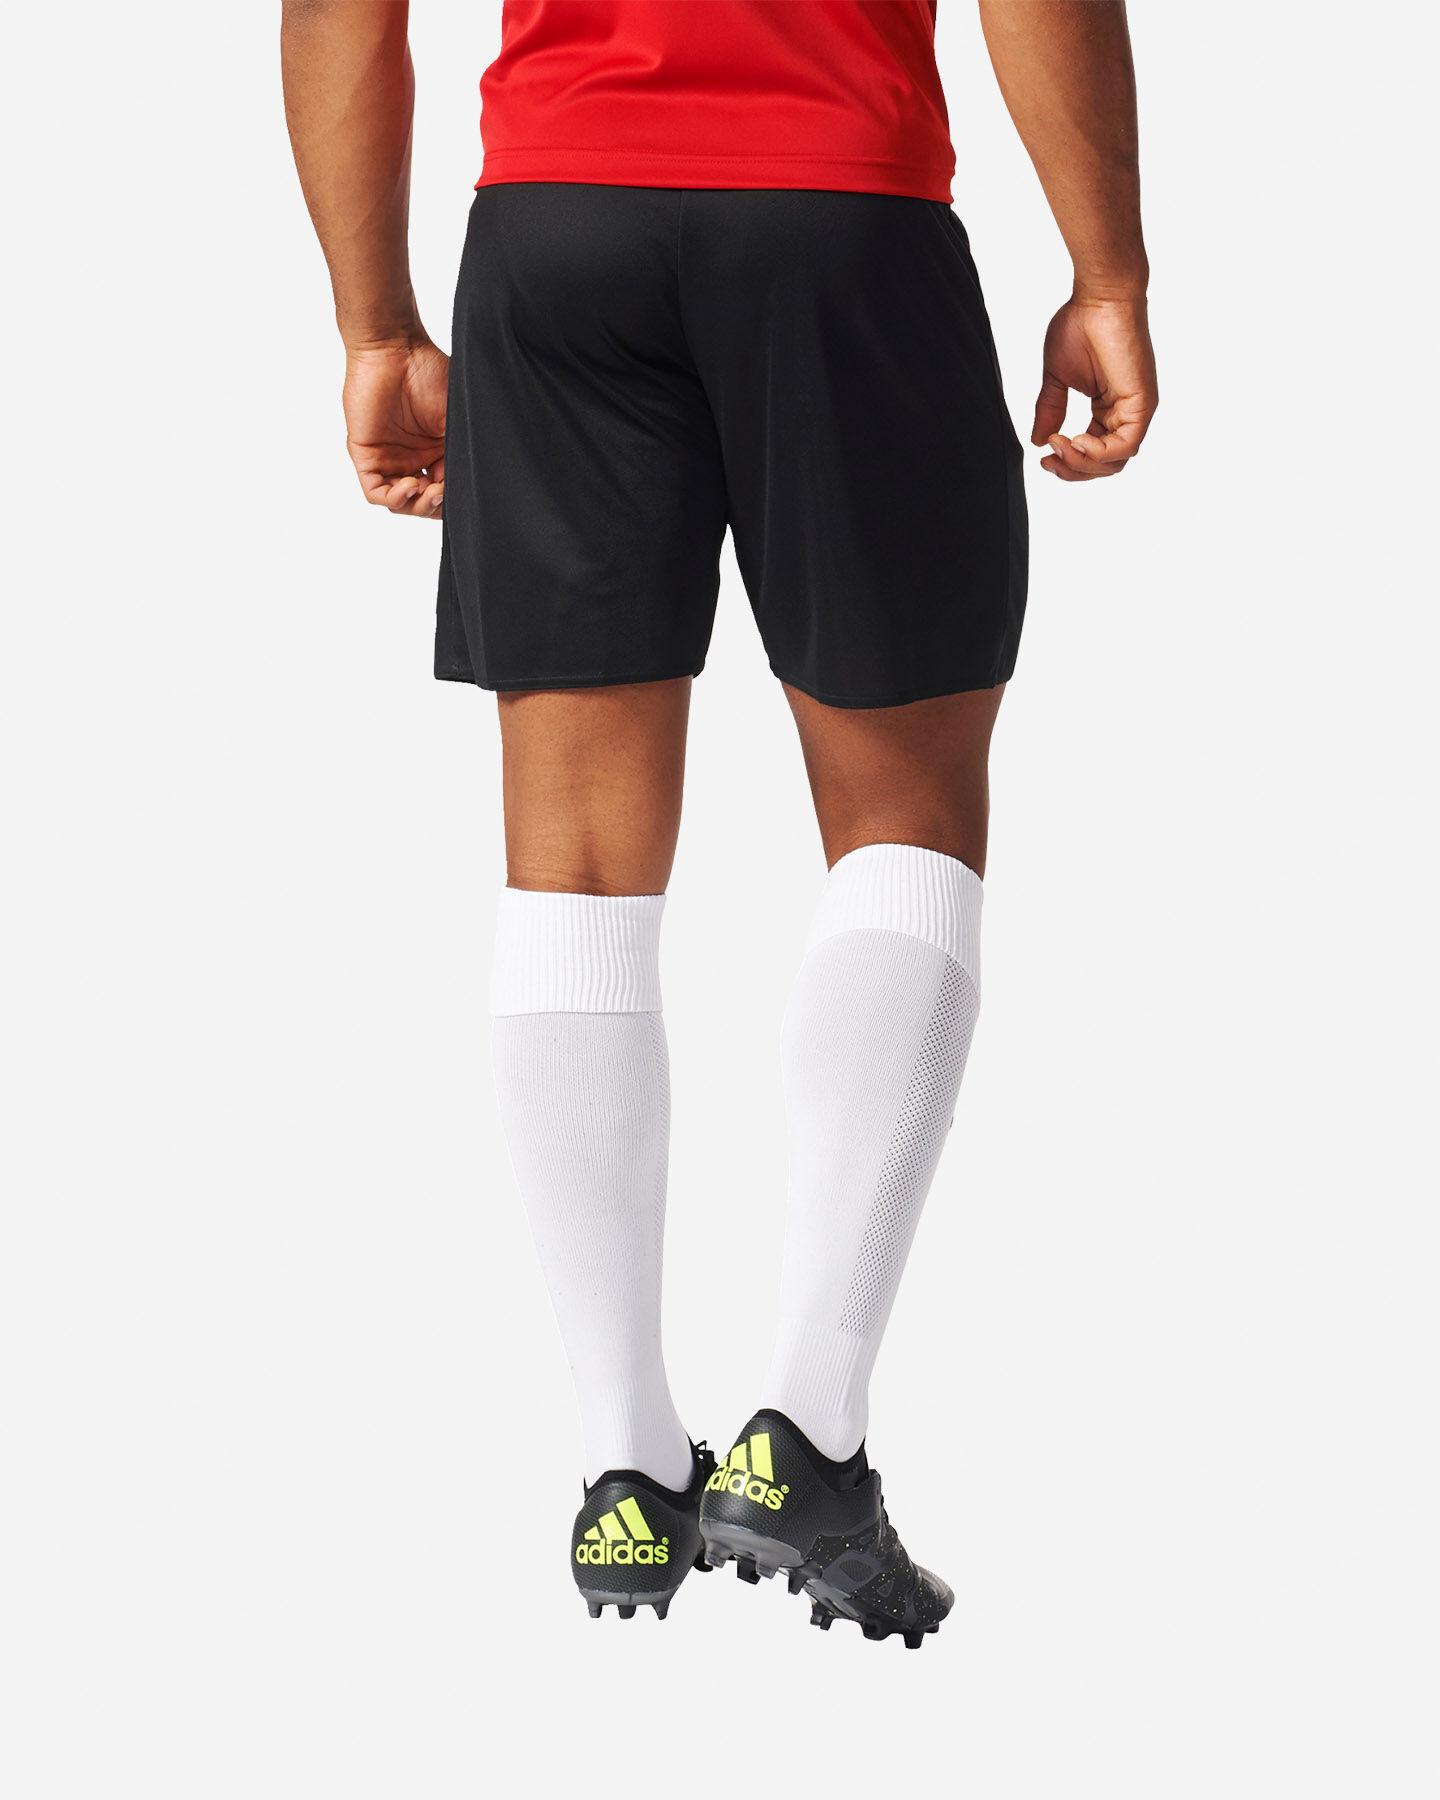 Pantaloncini calcio ADIDAS PARMA 16 M S1282138 scatto 2